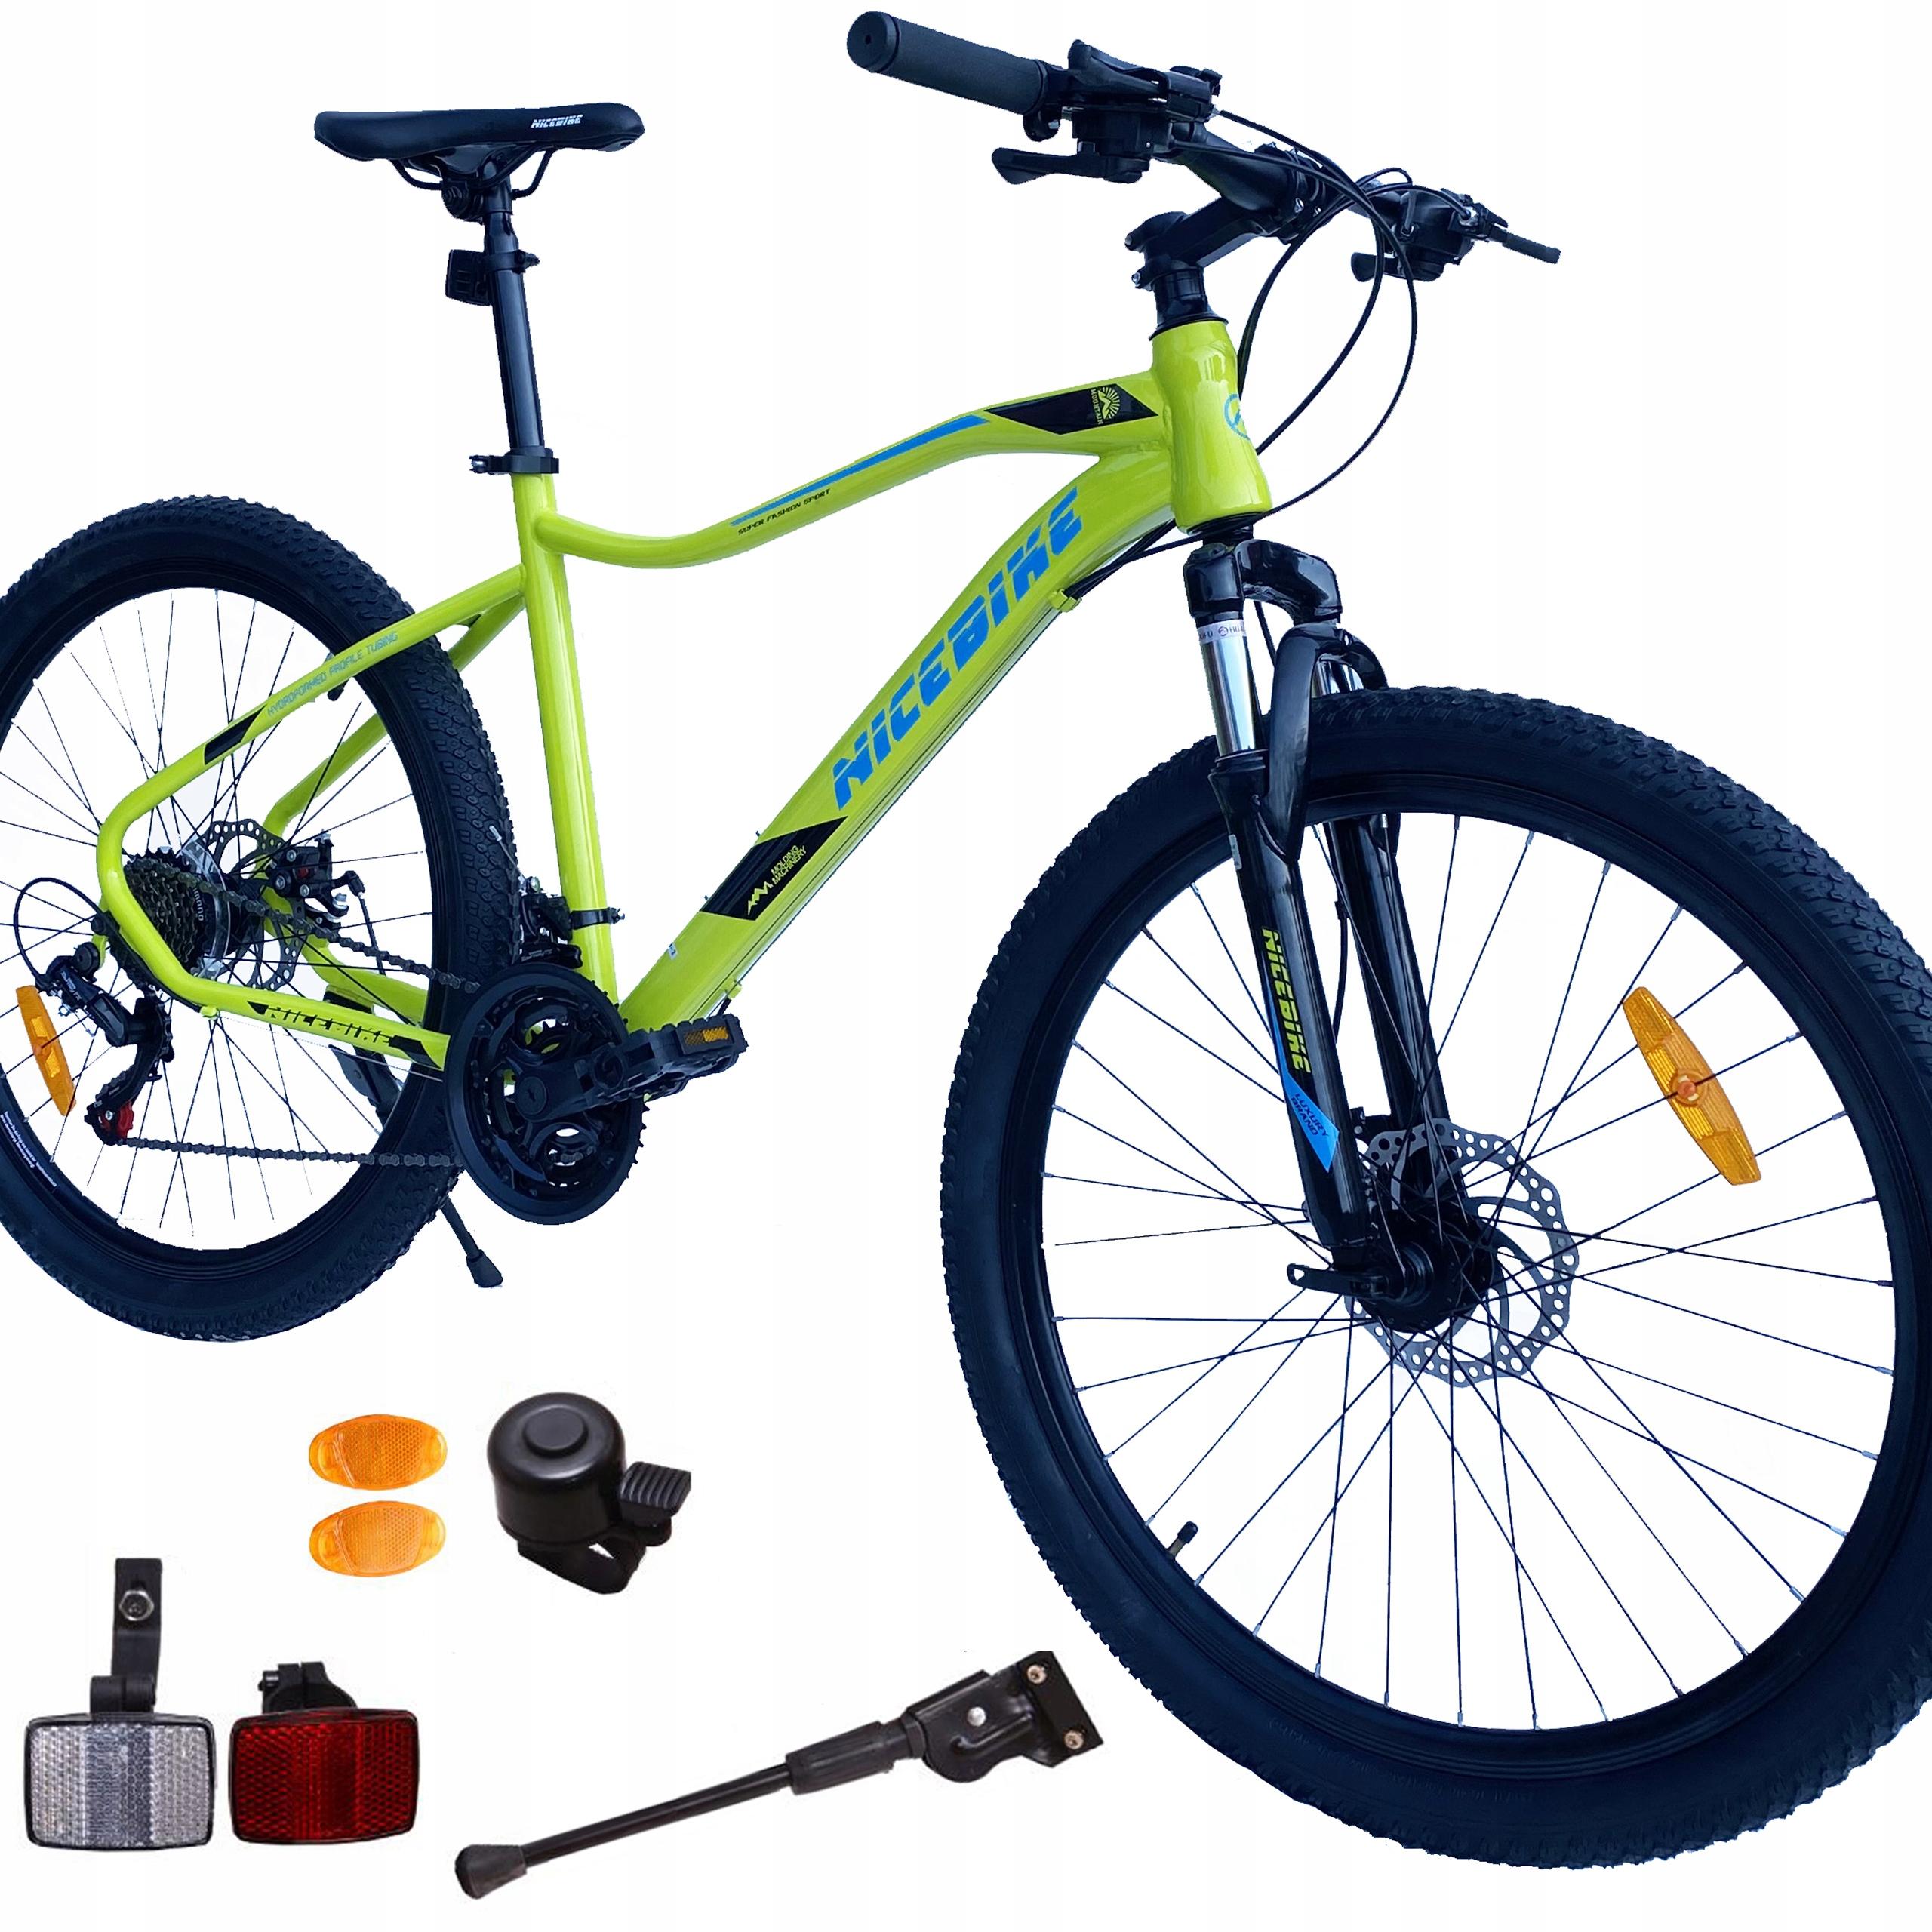 MOUNTAIN велосипед 115 SHIMANO 2x тормозные колодки